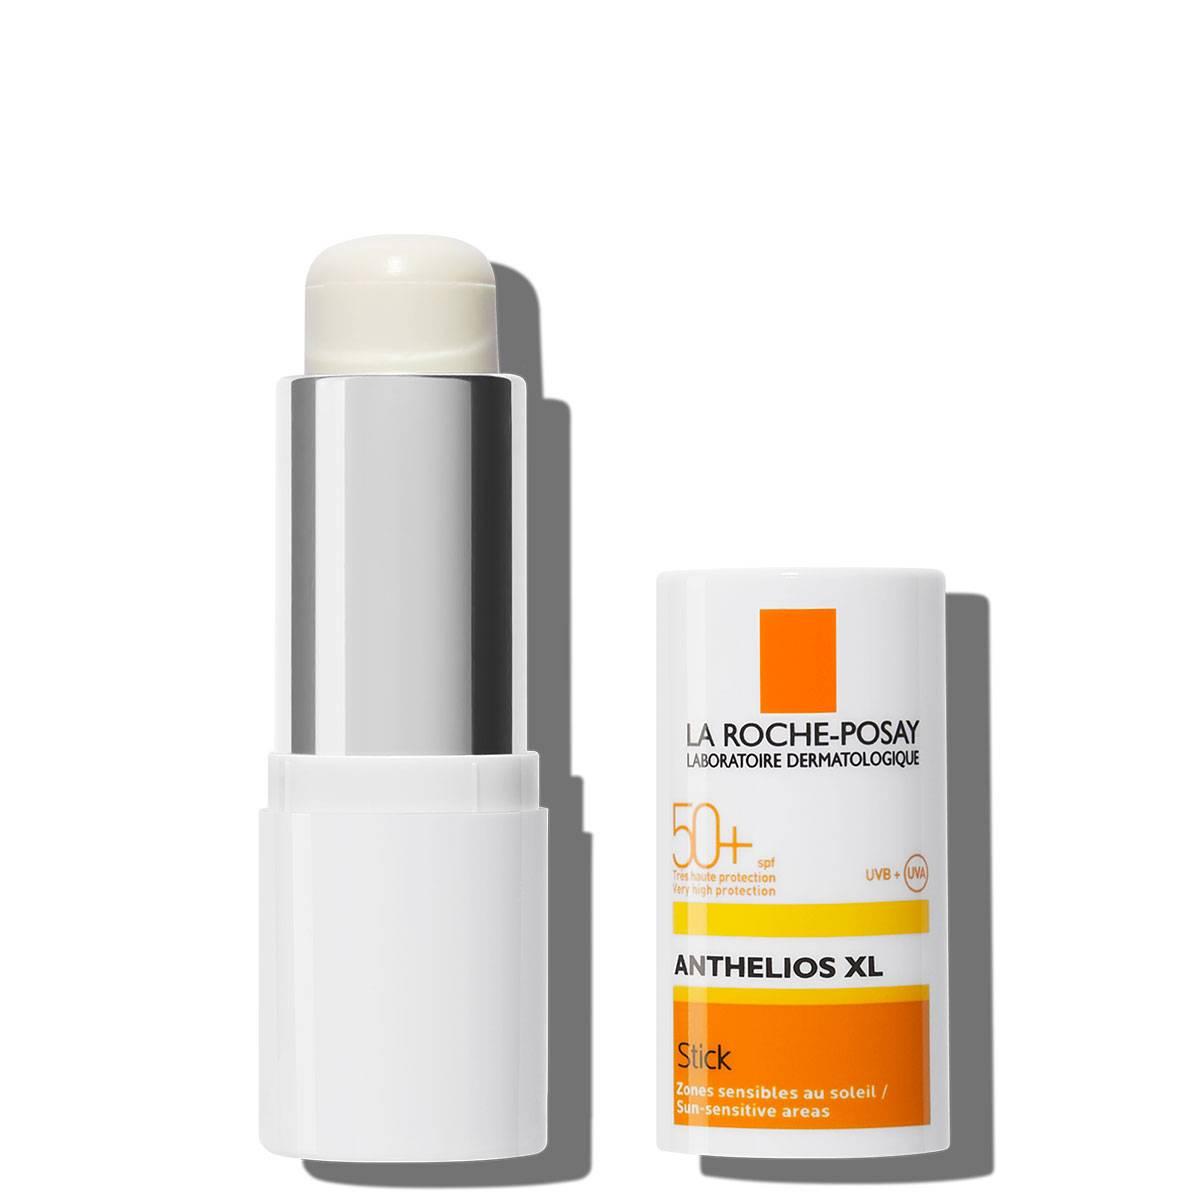 La Roche Posay ProductPage Sun Anthelios XL Stick Sensitive Area Spf50